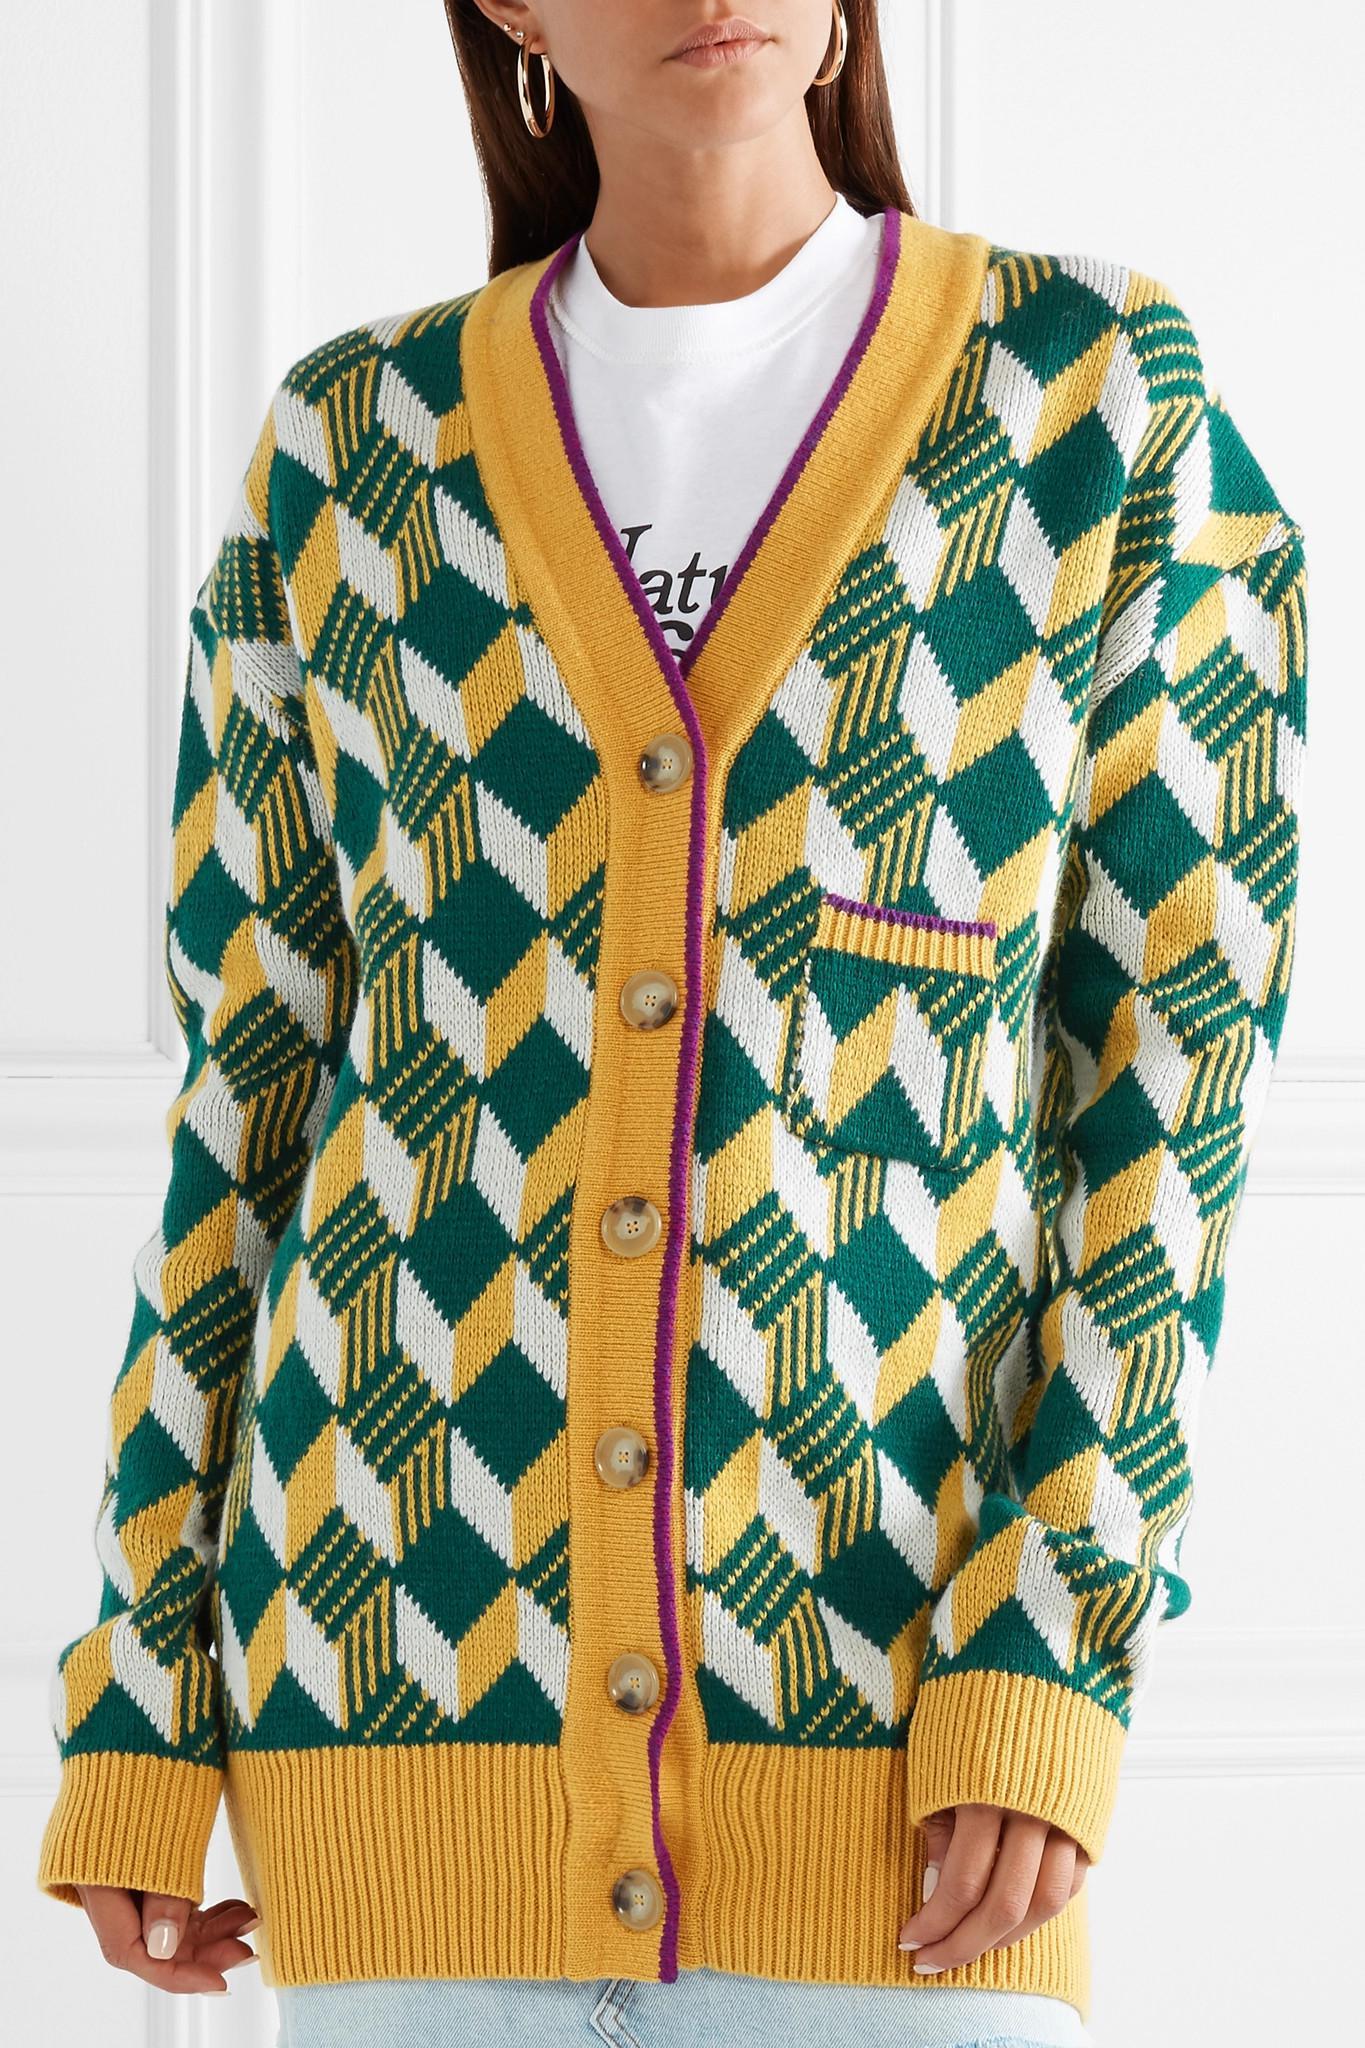 Alexa Chung Vintage Inspired Cardigan